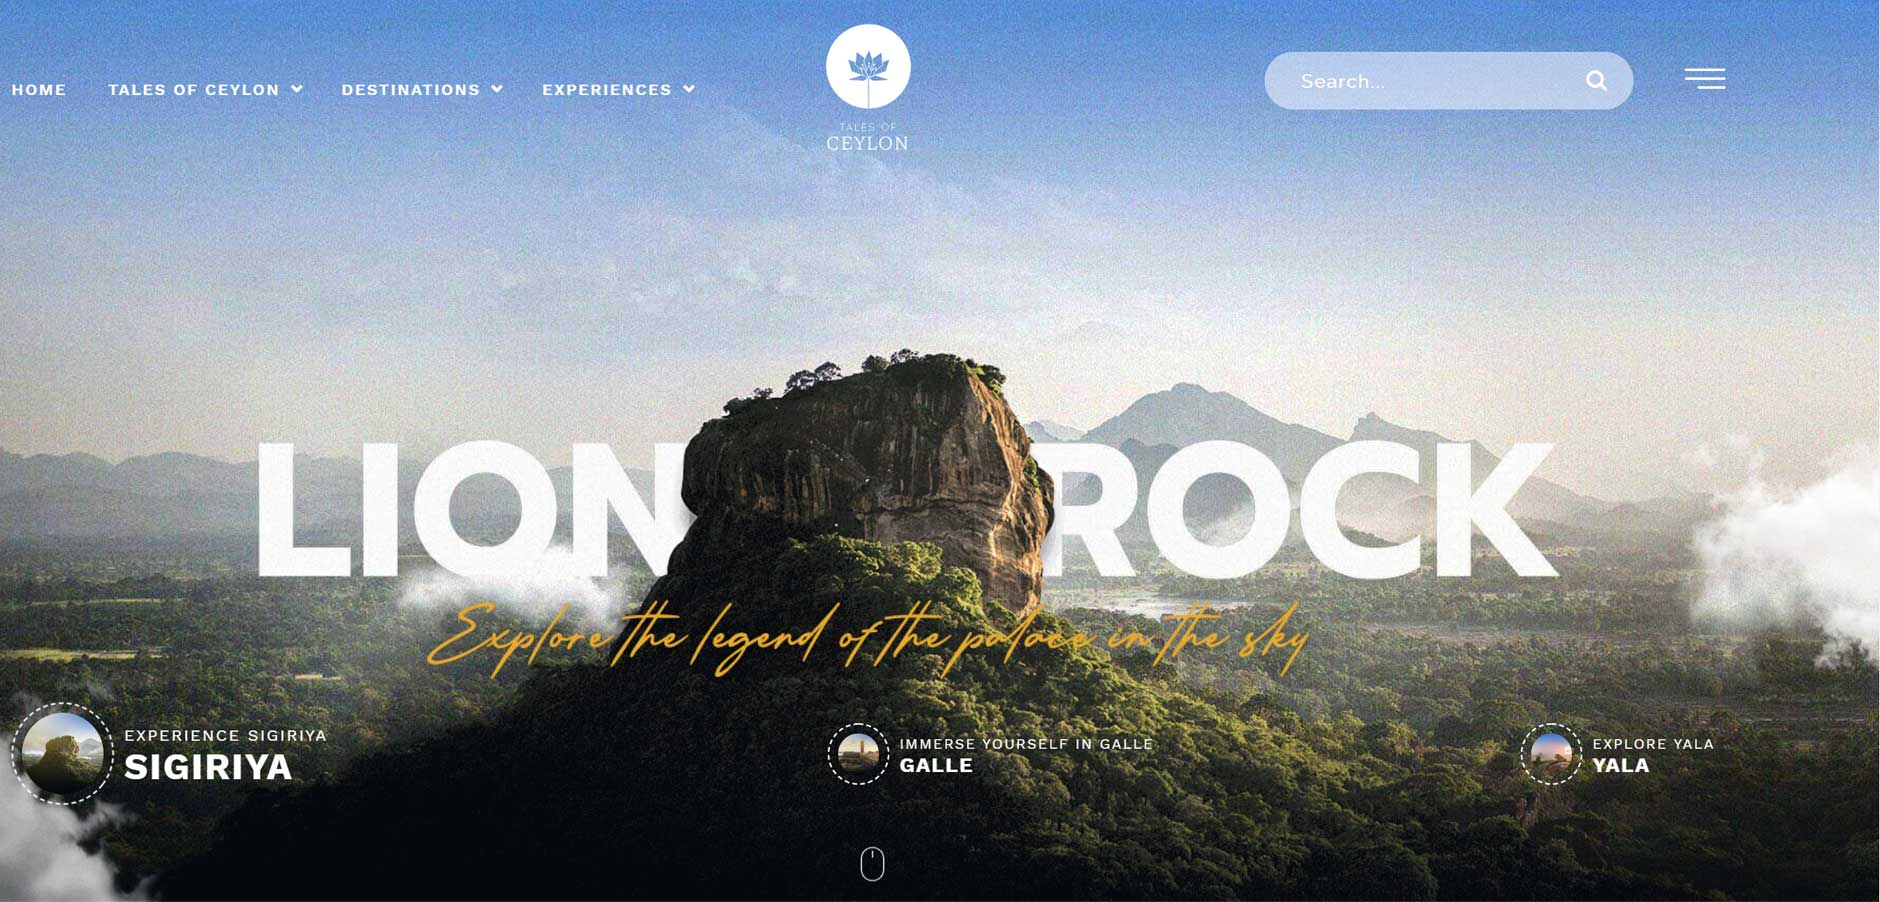 Big Bold Fonts - Top Web Design Trends for 2020